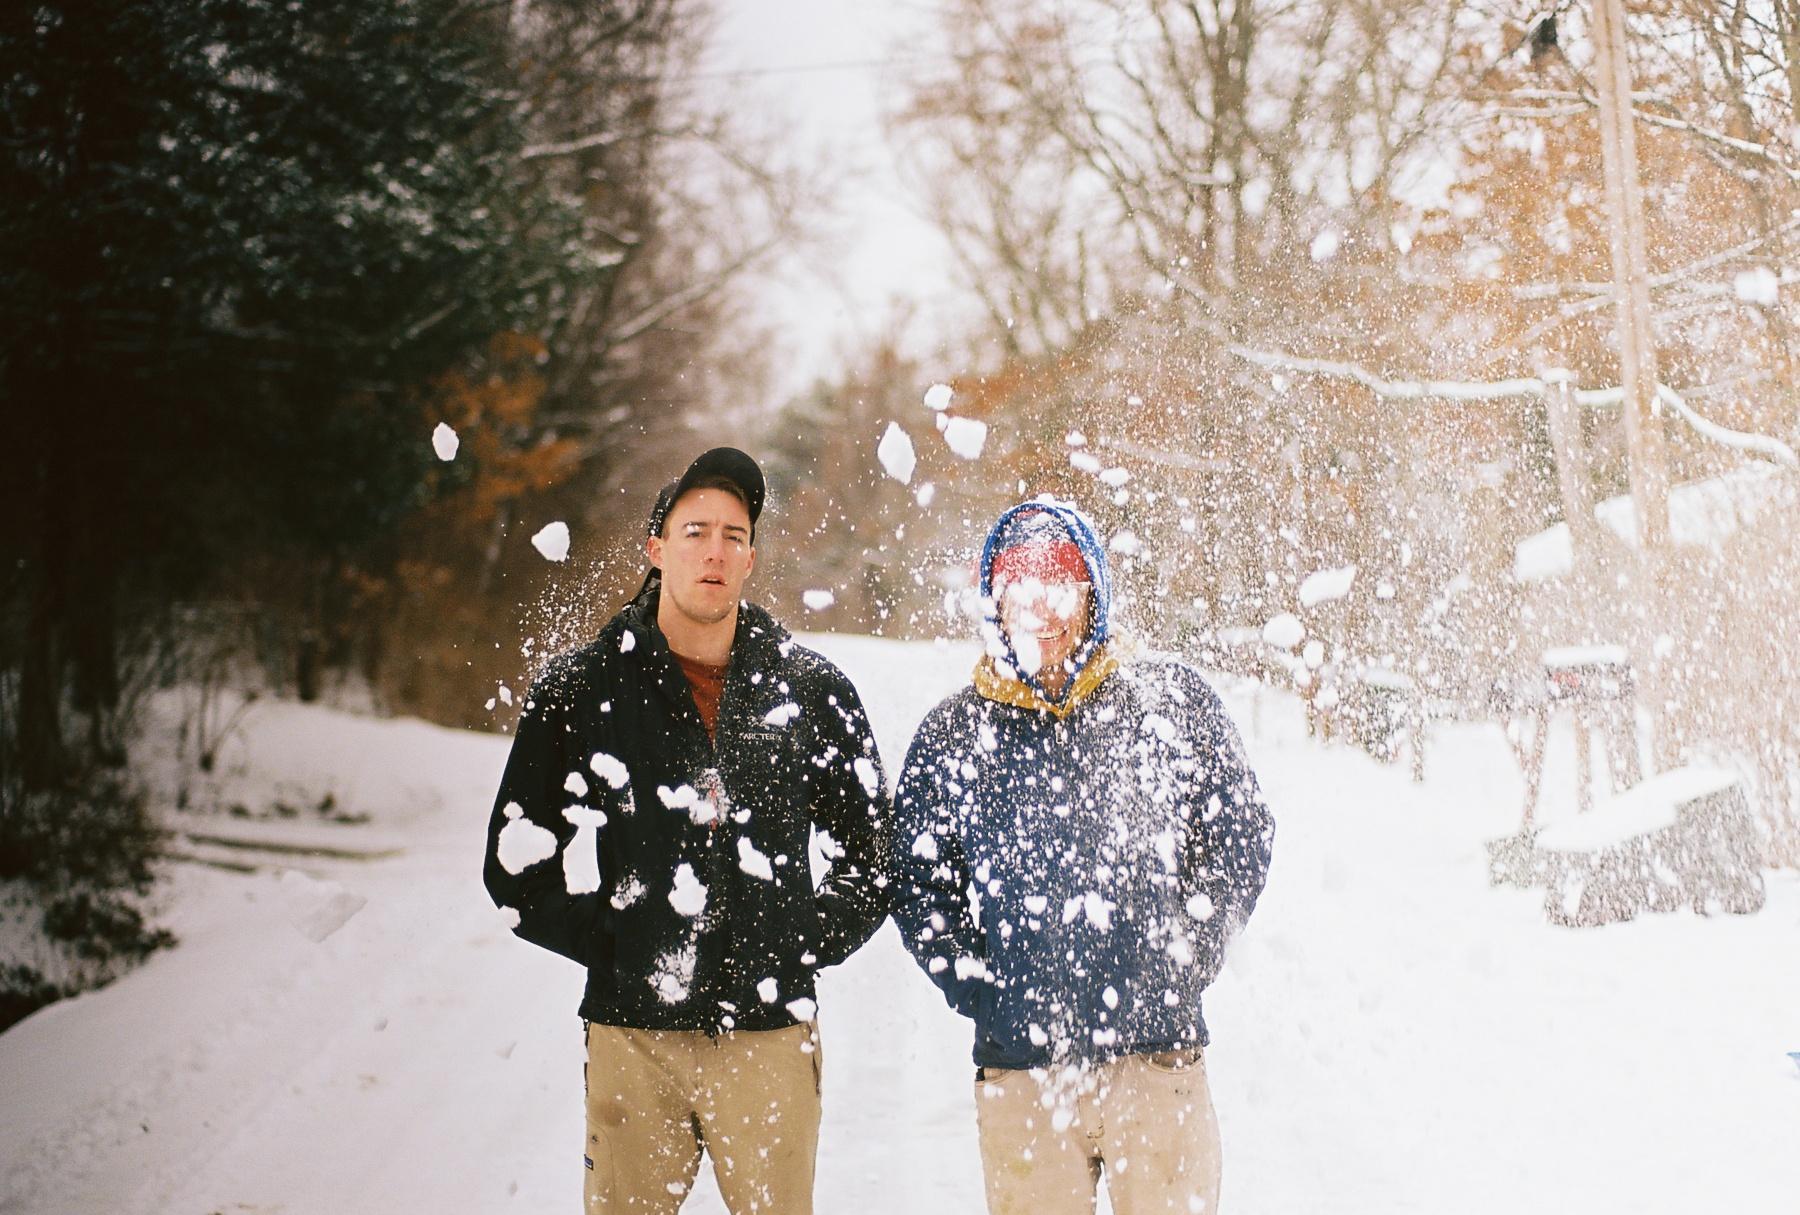 Ben Matthews // Shoot More Film - image 1 - student project